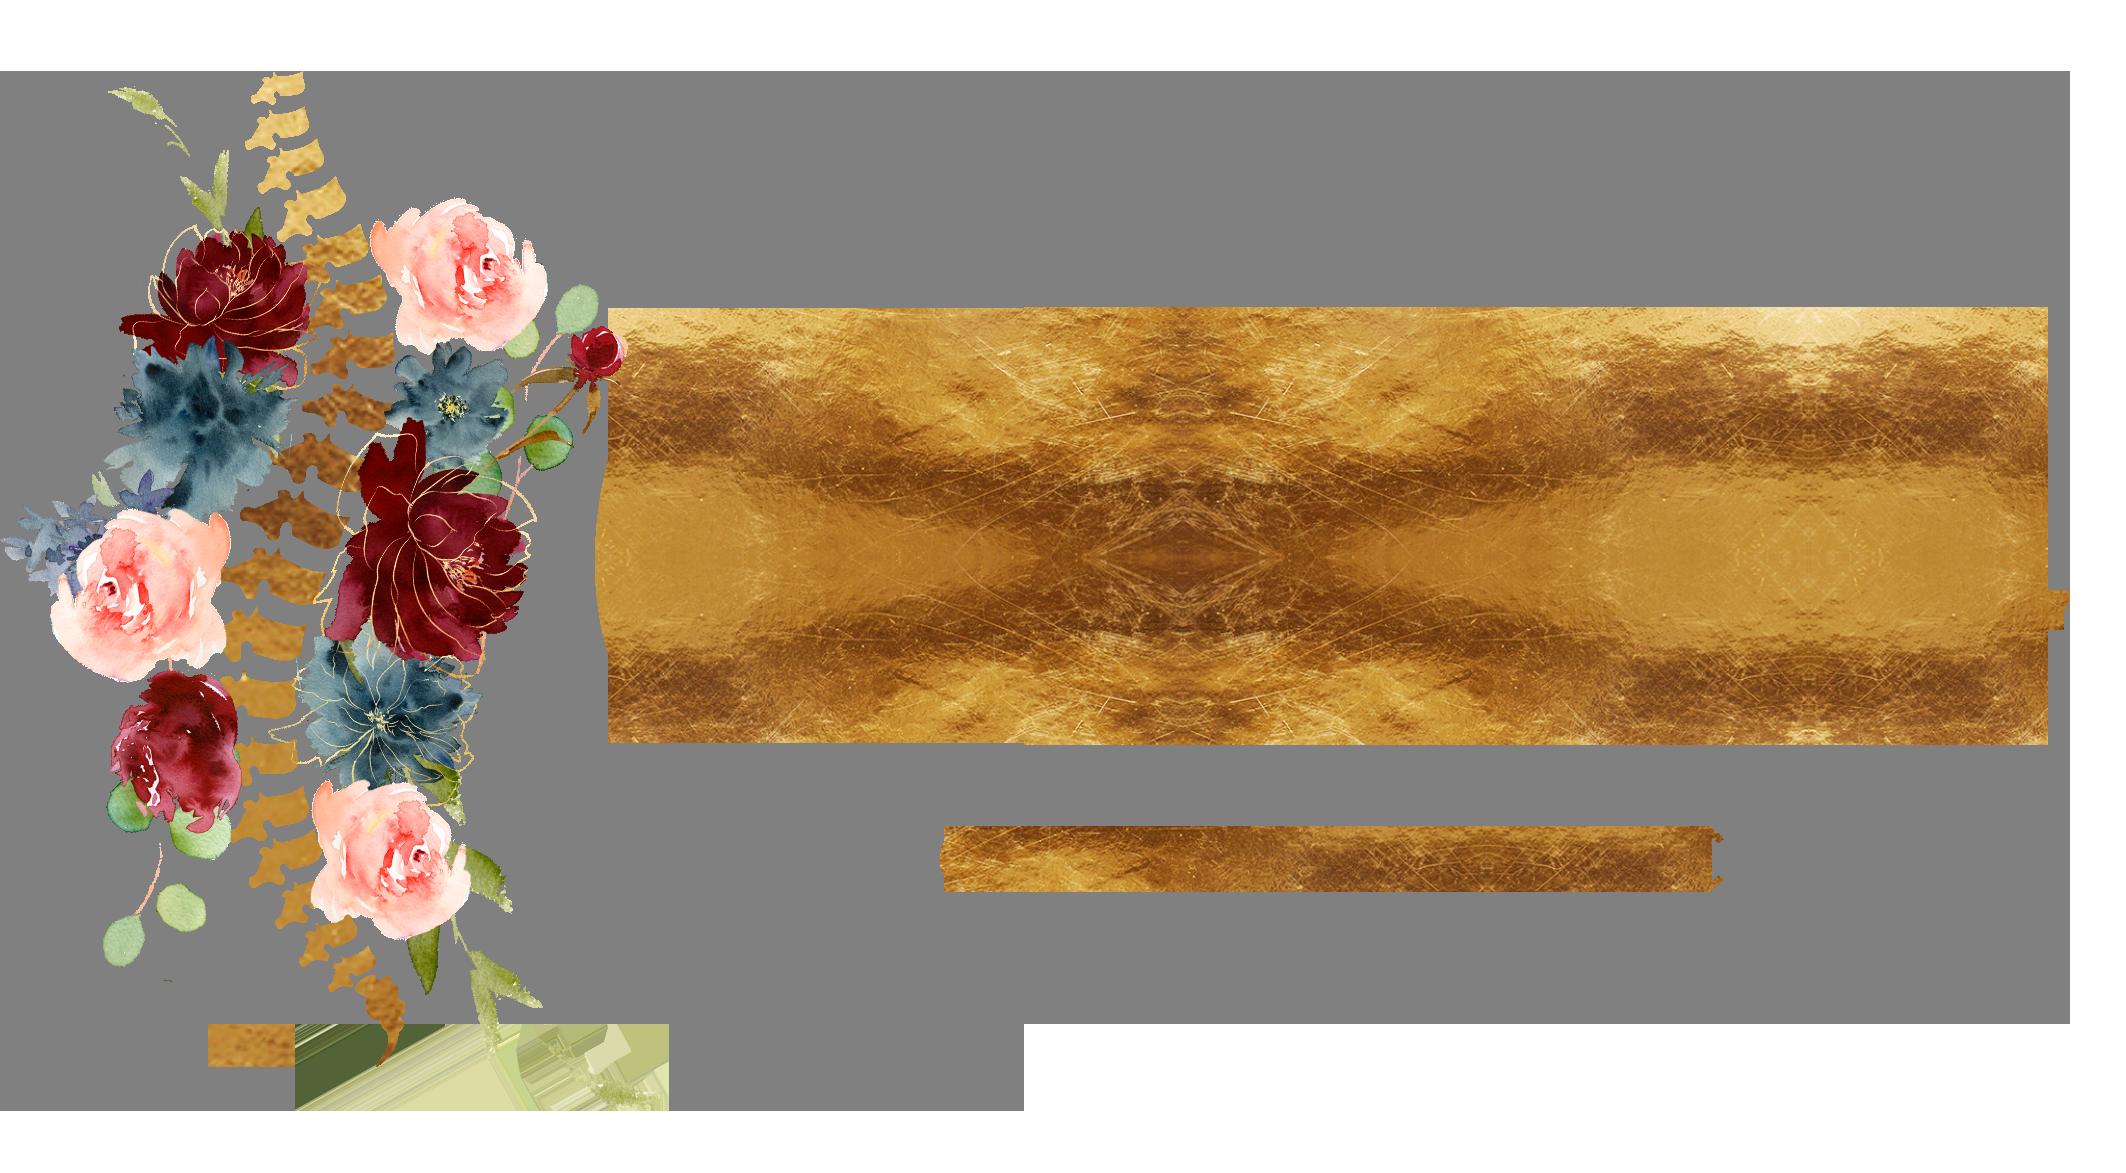 cornelius2.png